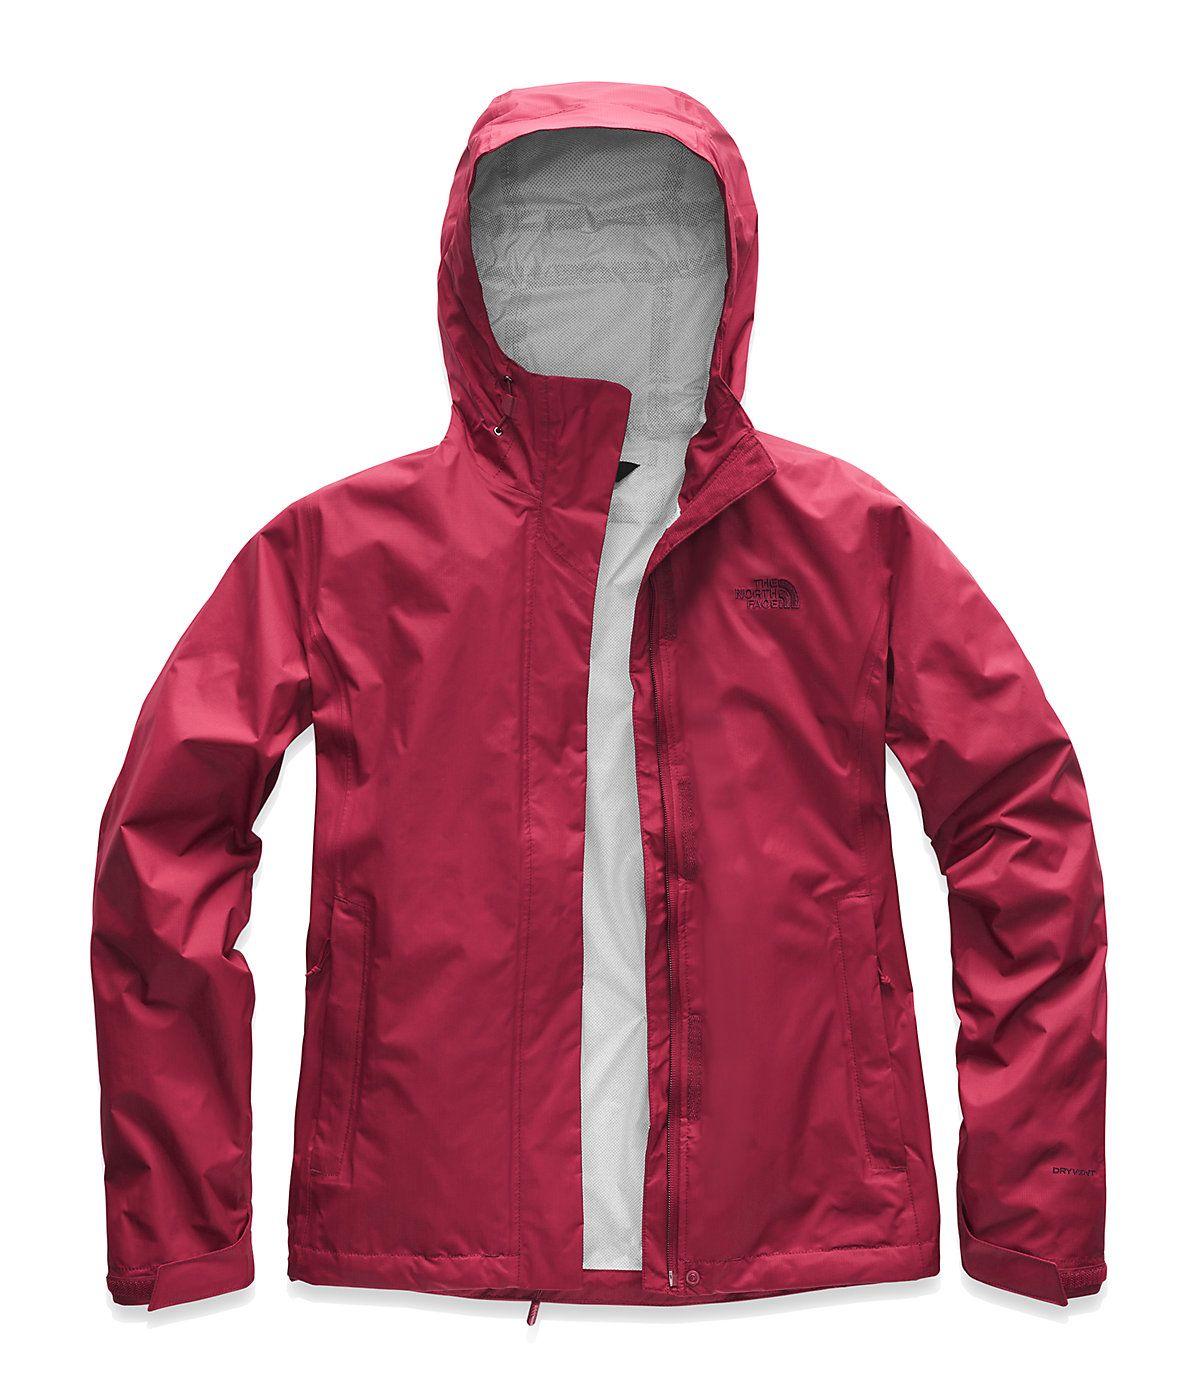 The North Face Women's Venture 2 Jacket | Rain jacket women